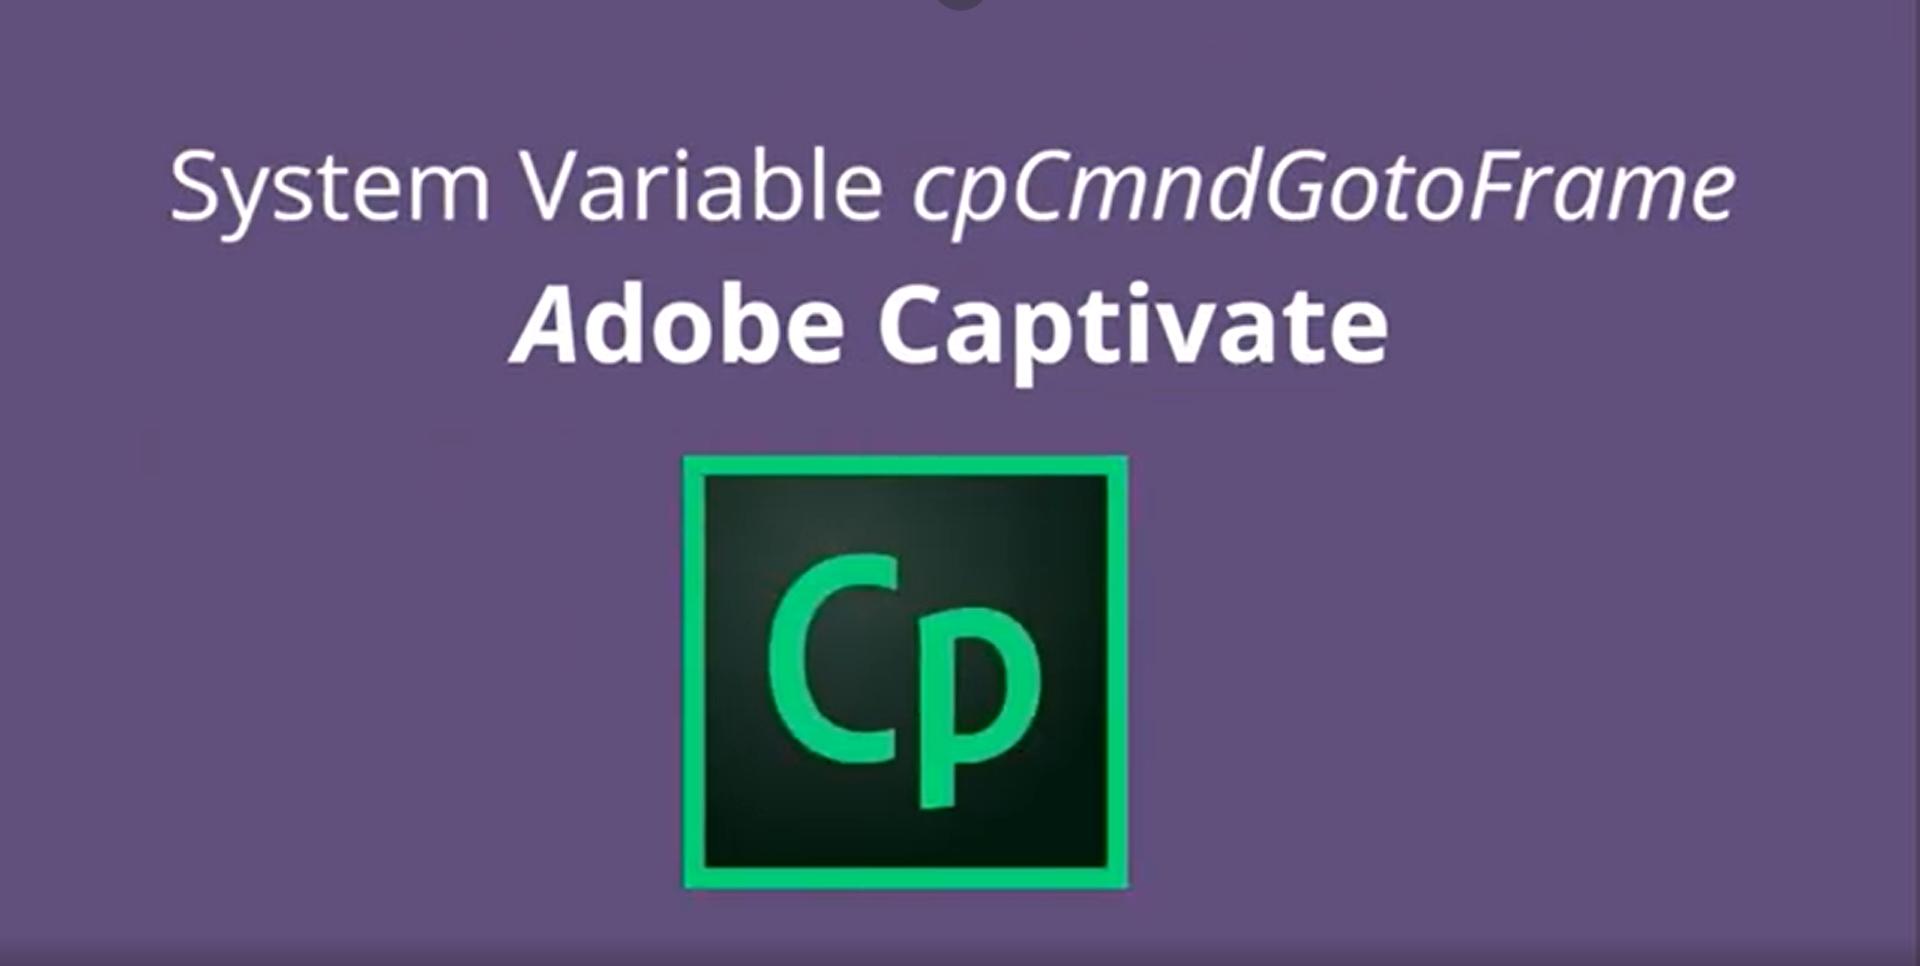 System Variable cpcmndGotoFrame in Adobe Captivate